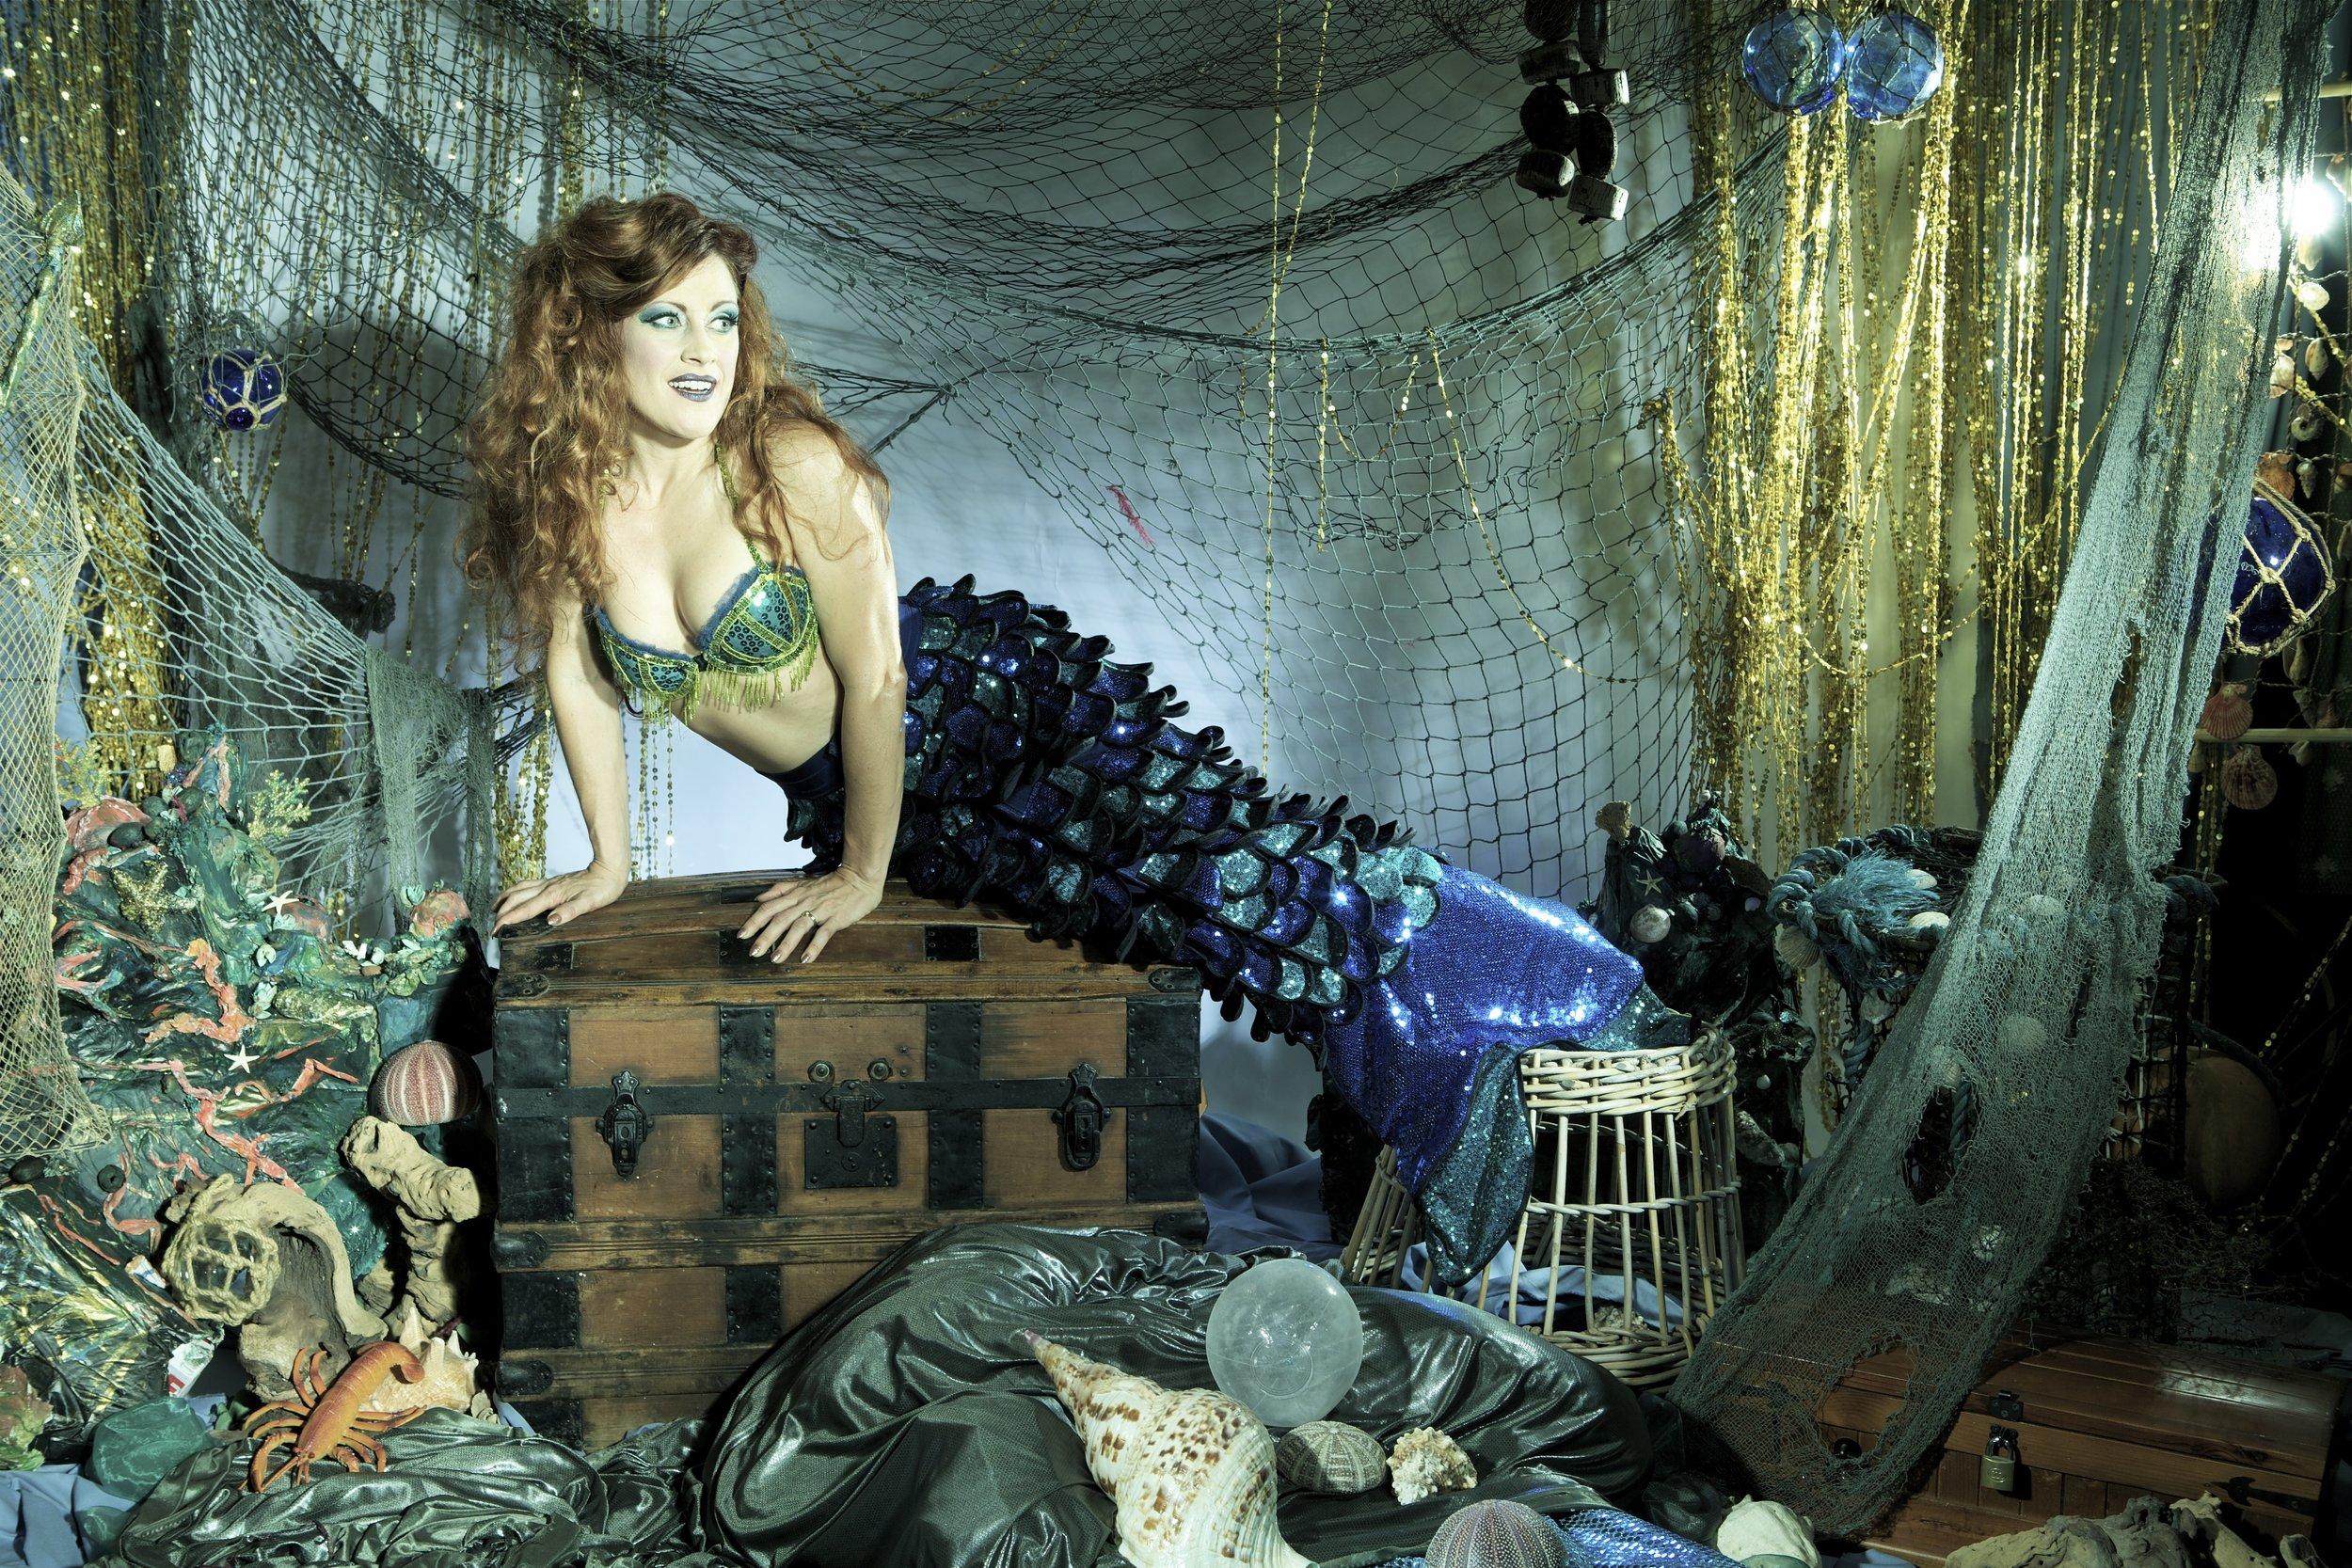 trixie 076.jpg